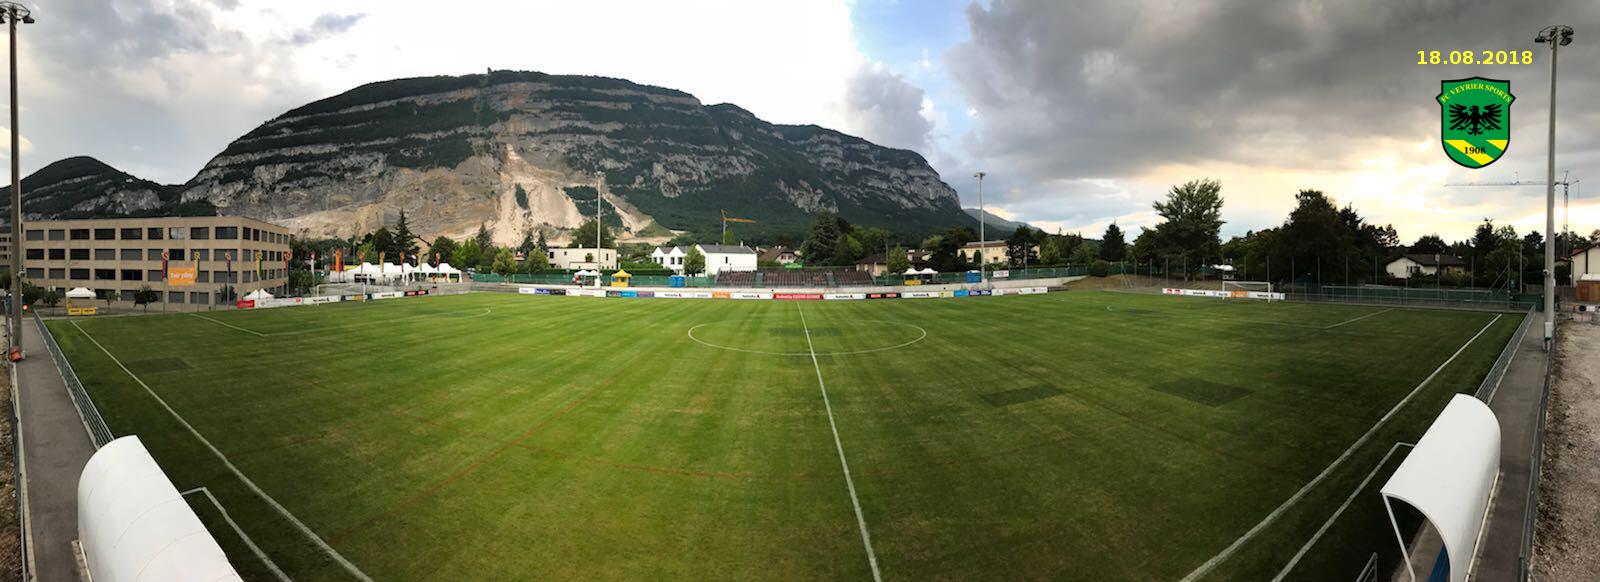 Stade Veyrier-Village